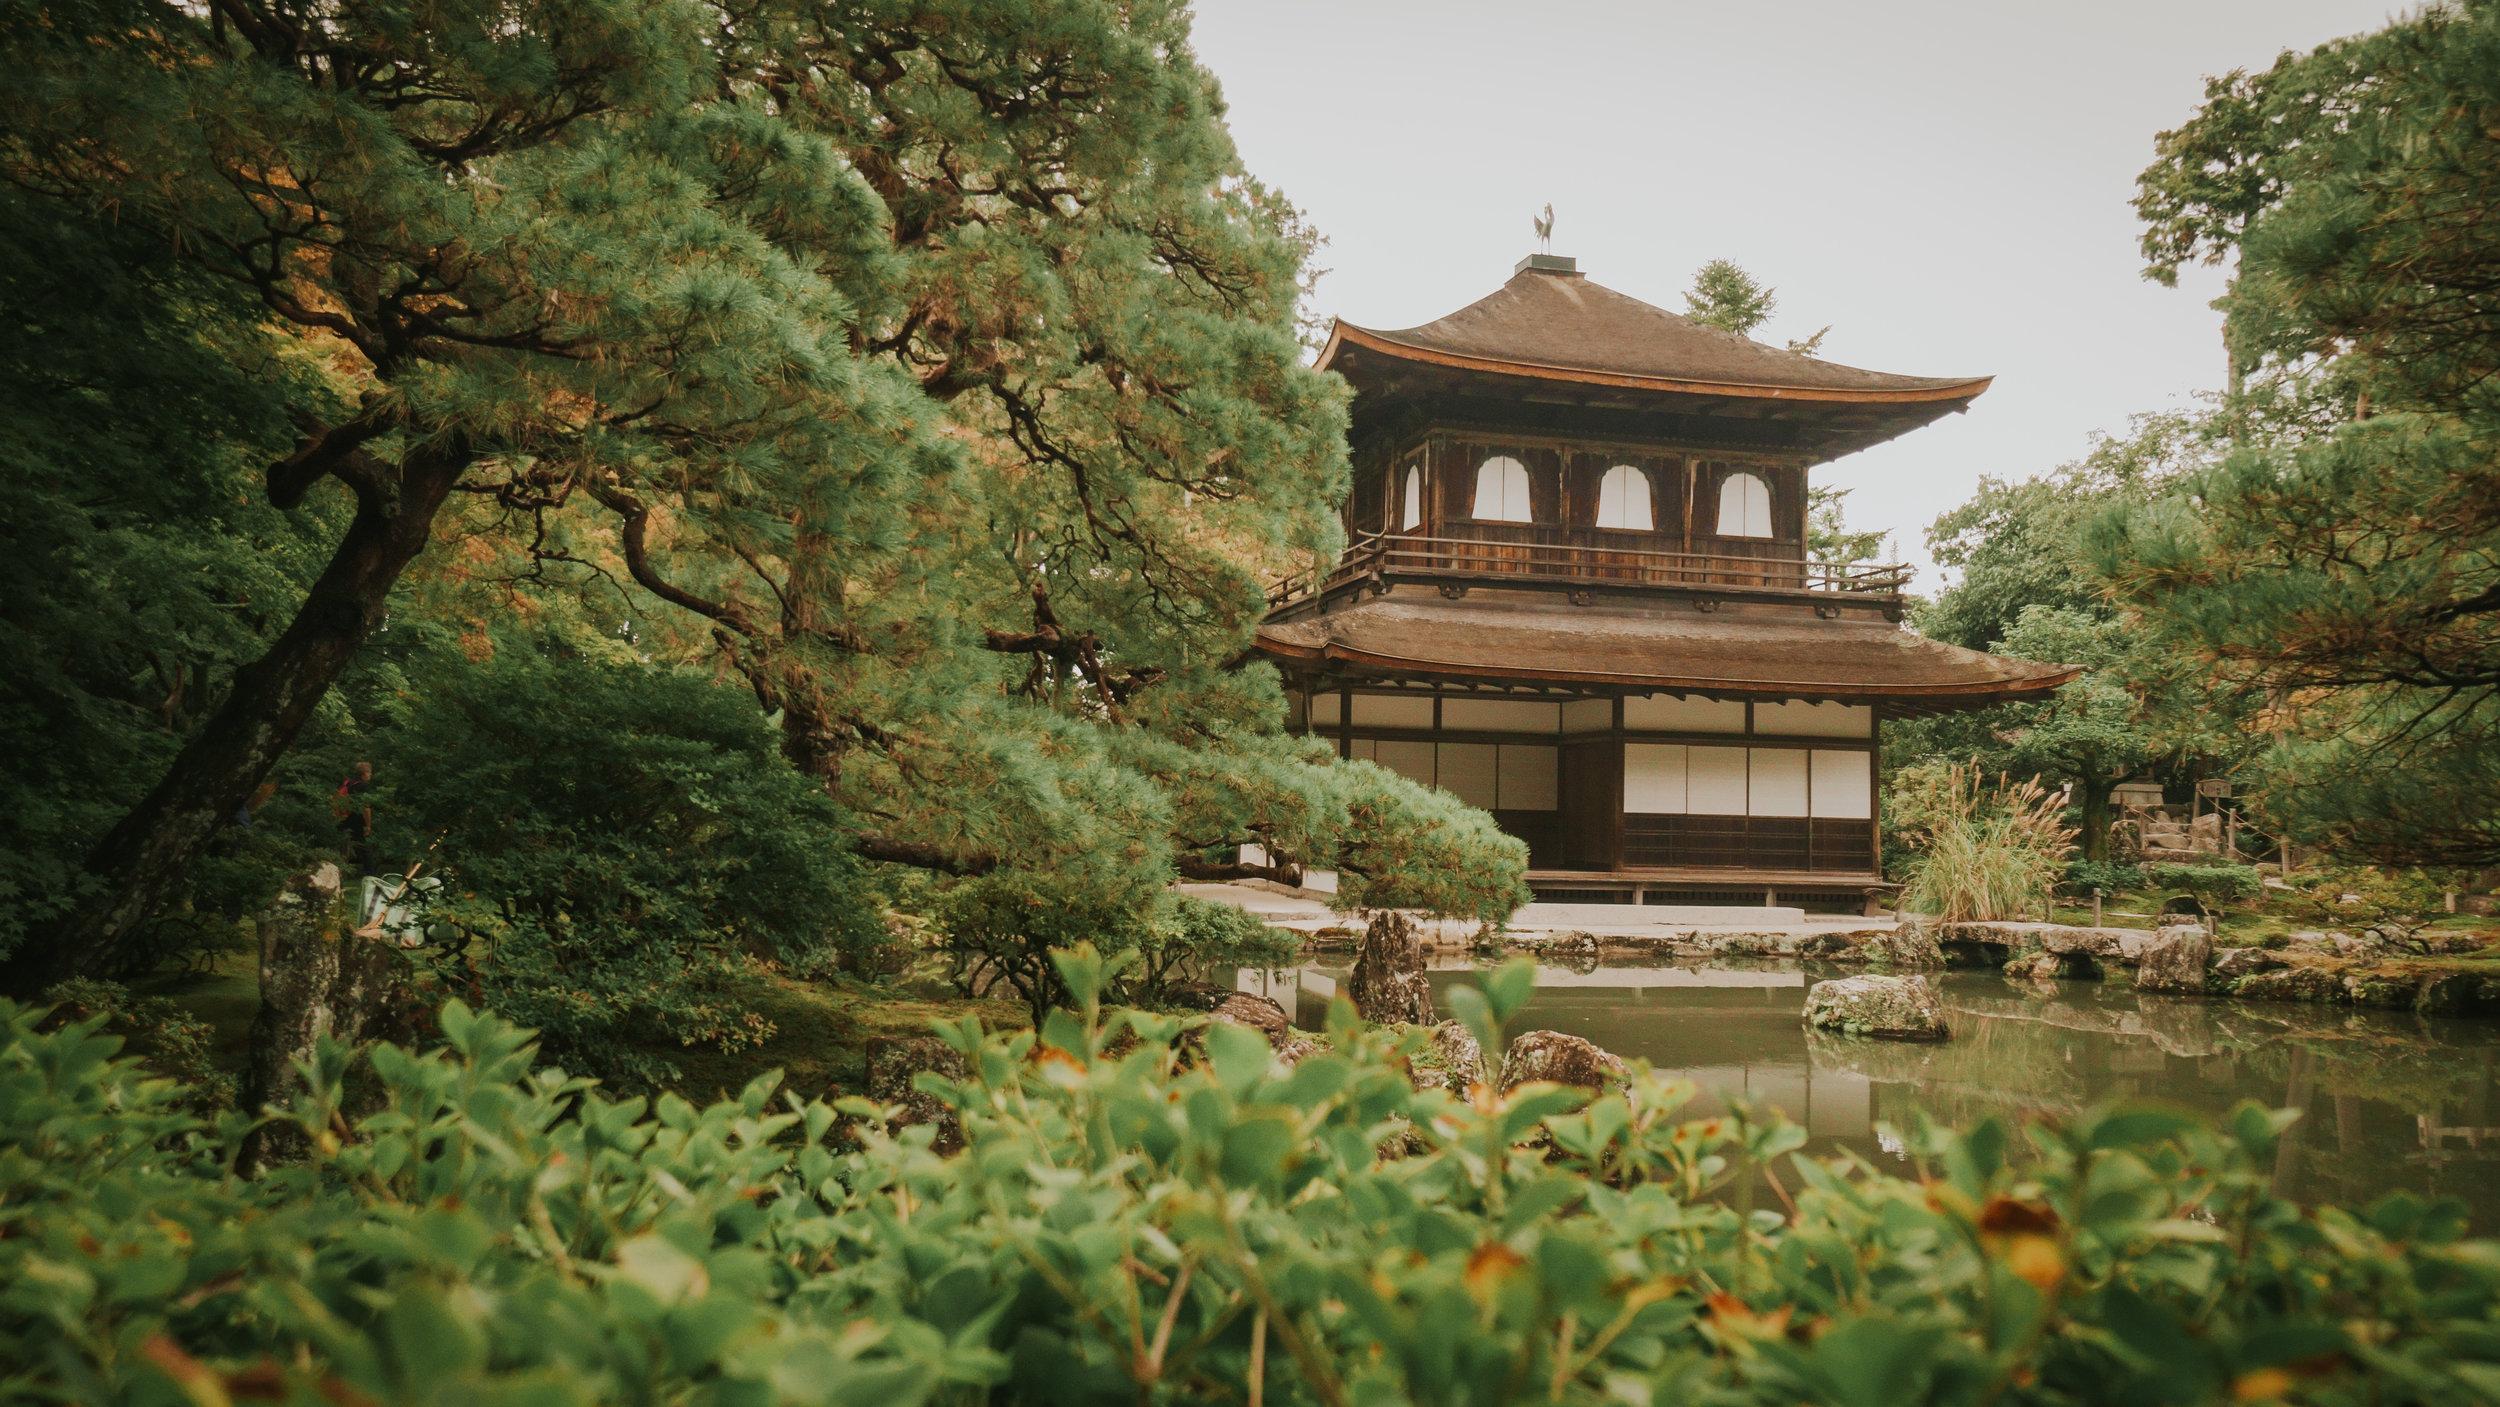 Daikakuji Temple from the pathway